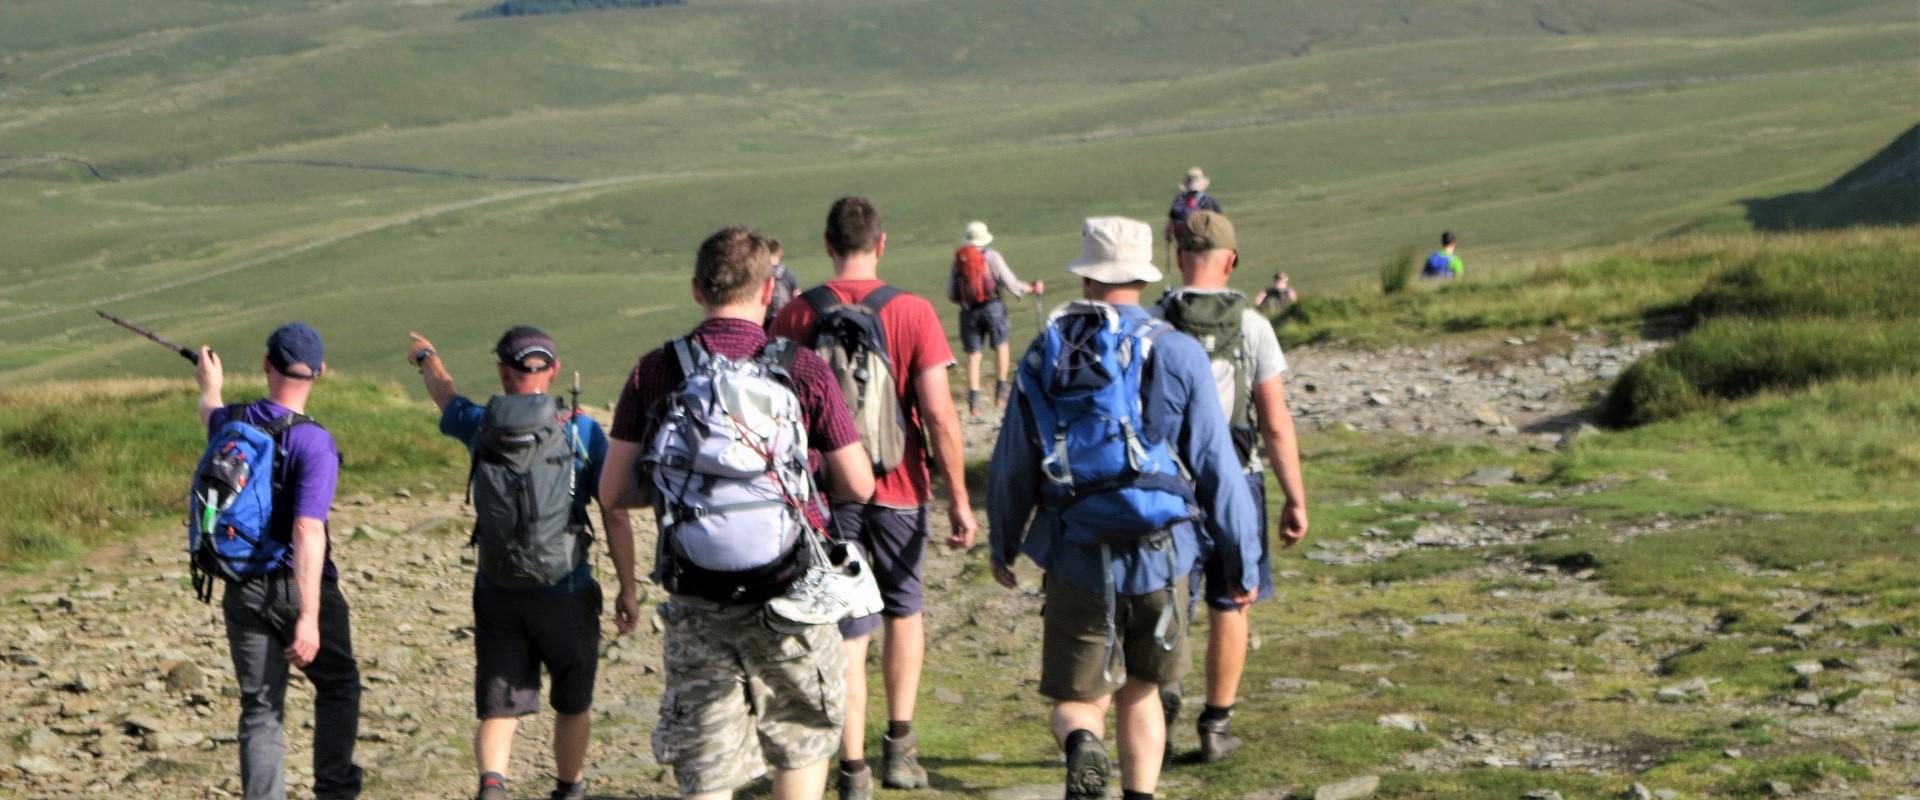 Yorkshire 3 Peaks Challenge Walk